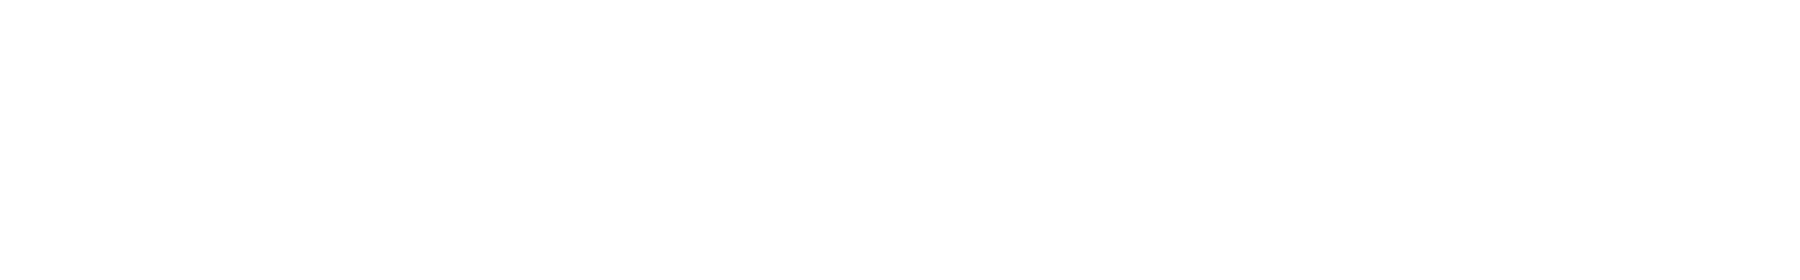 alvinspk18